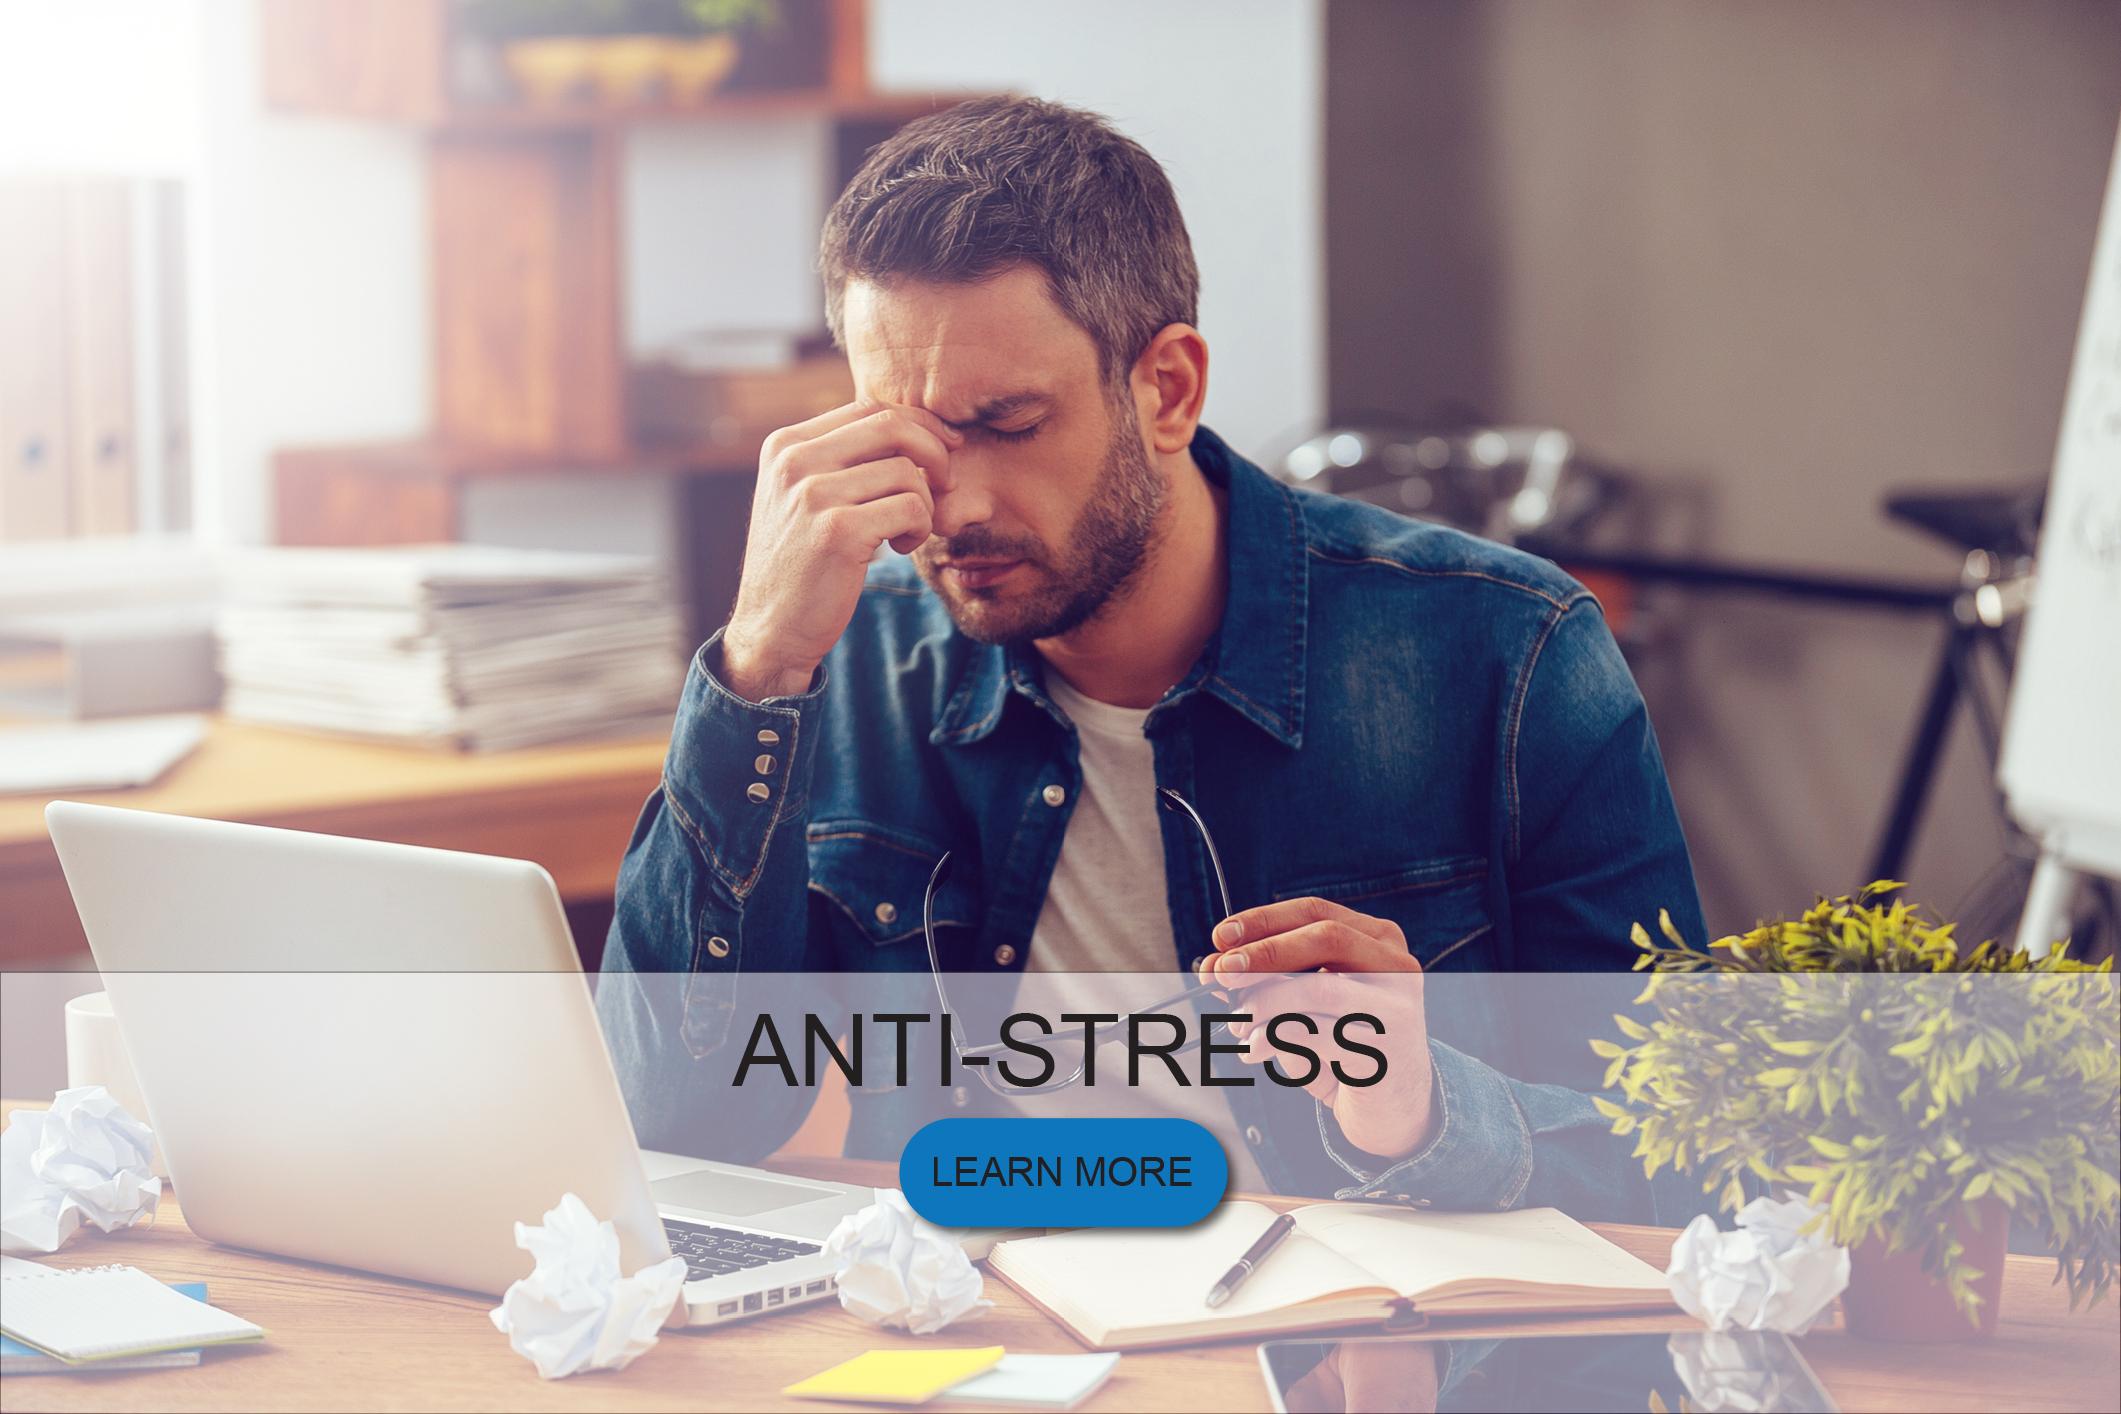 anti_stress_banner.jpg